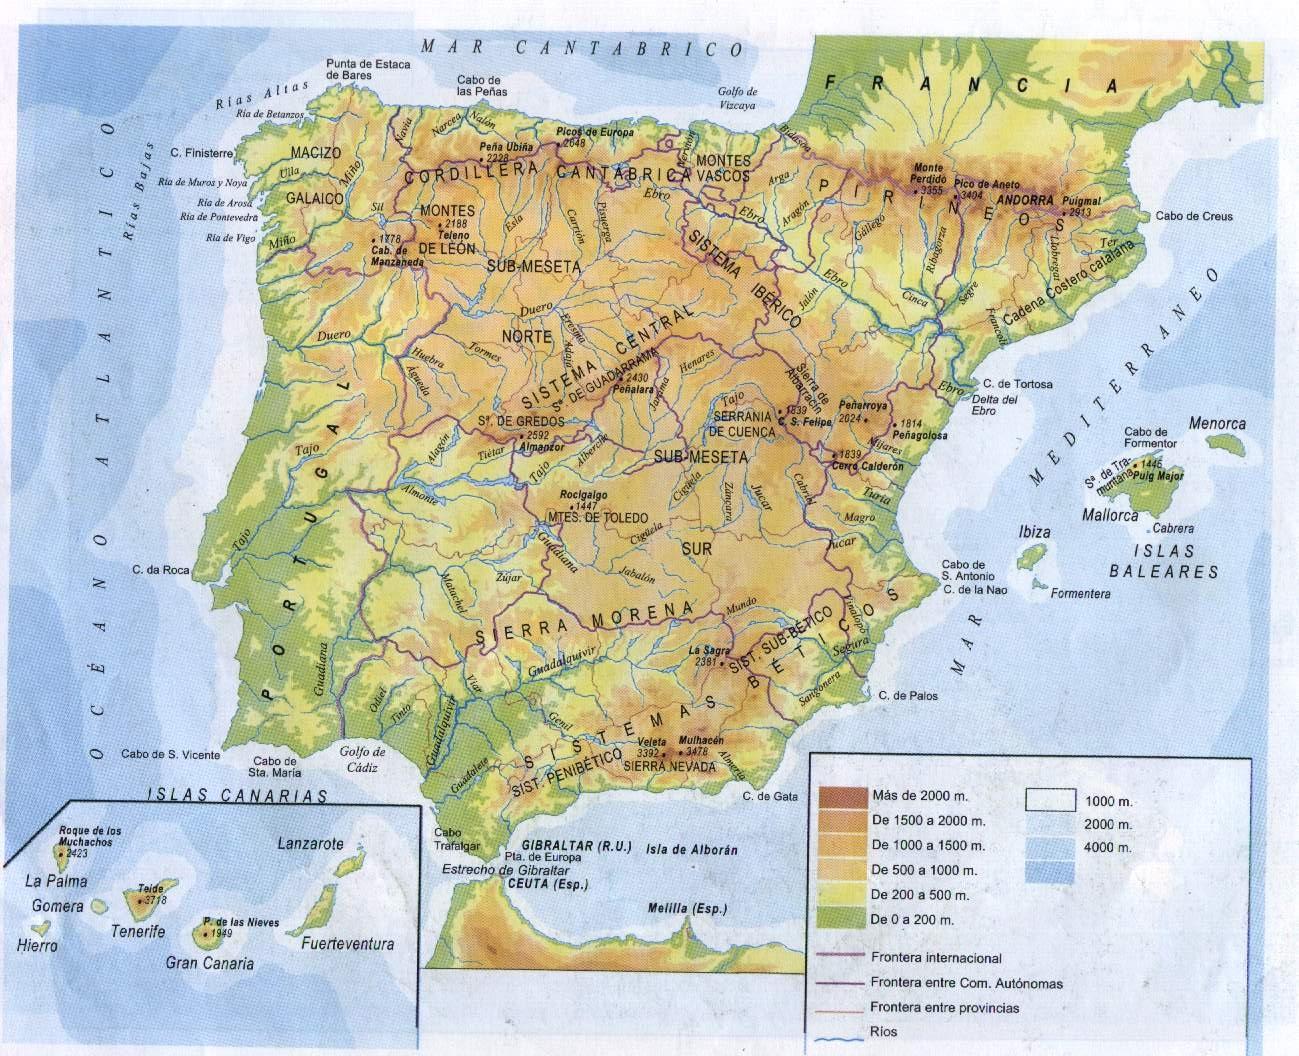 Mapa Interactivo De Espana Fisico.Blog De Geografia E Historia 1ºeso Ies La Flota Mapa Interactivo De Europa Y Espana